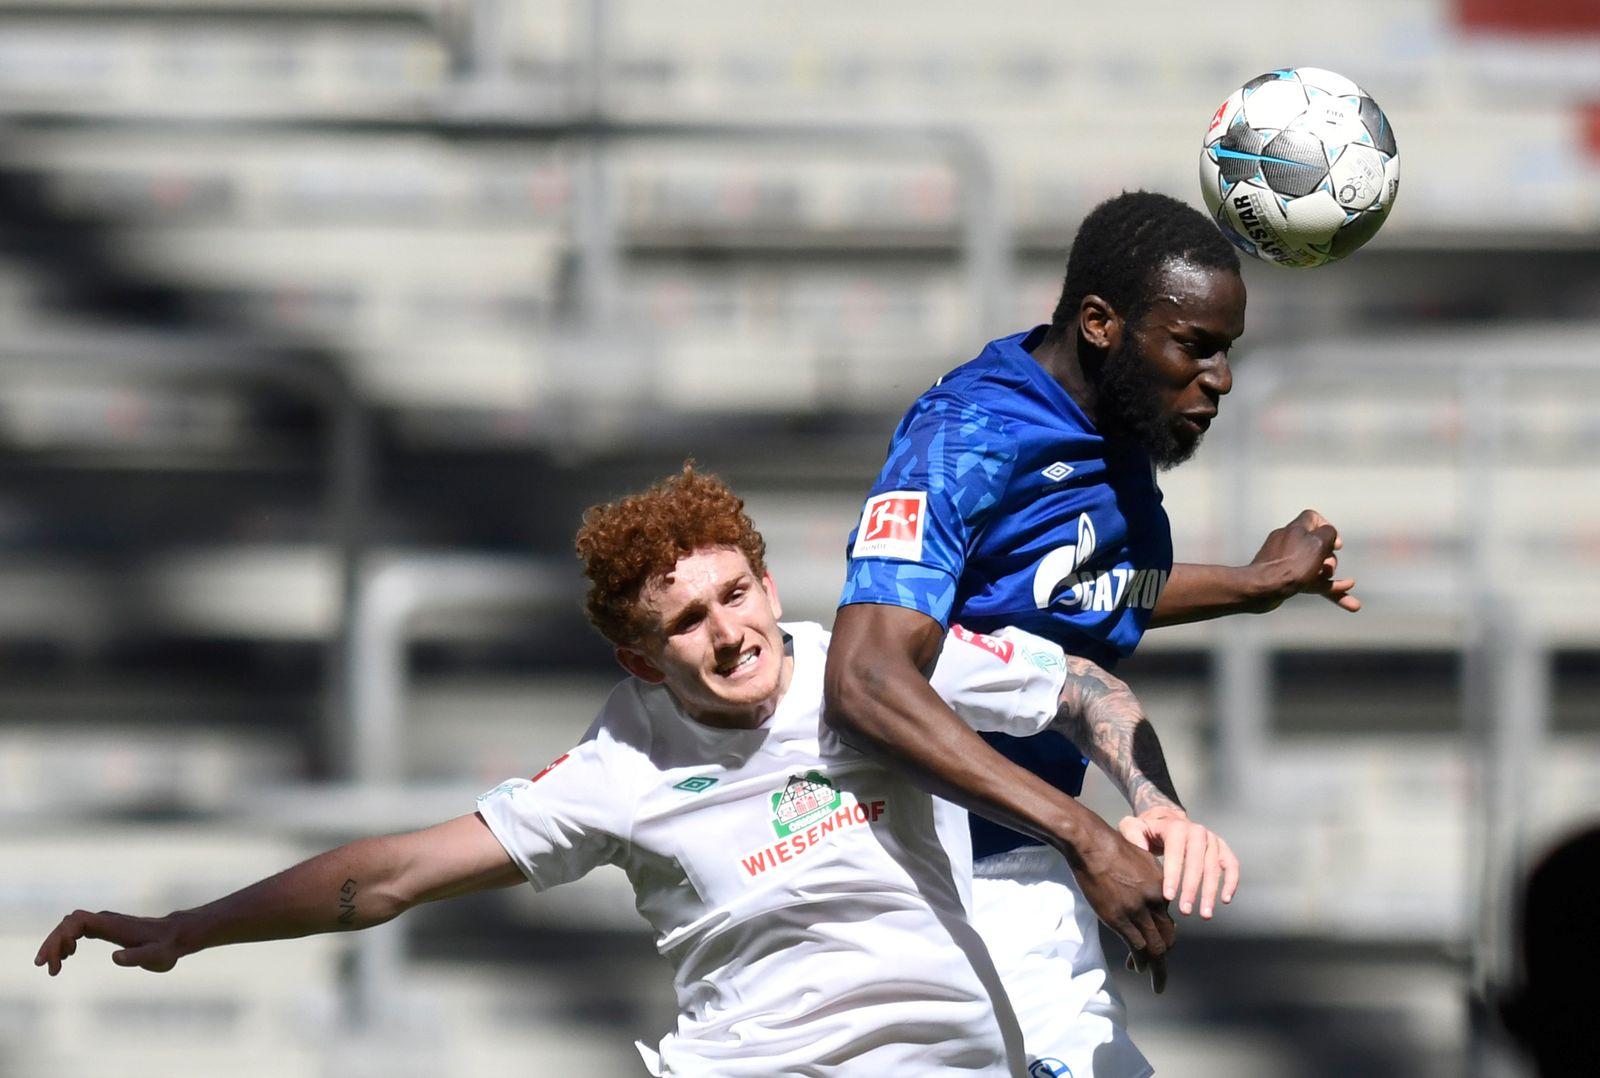 Bundesliga - Schalke 04 v Werder Bremen